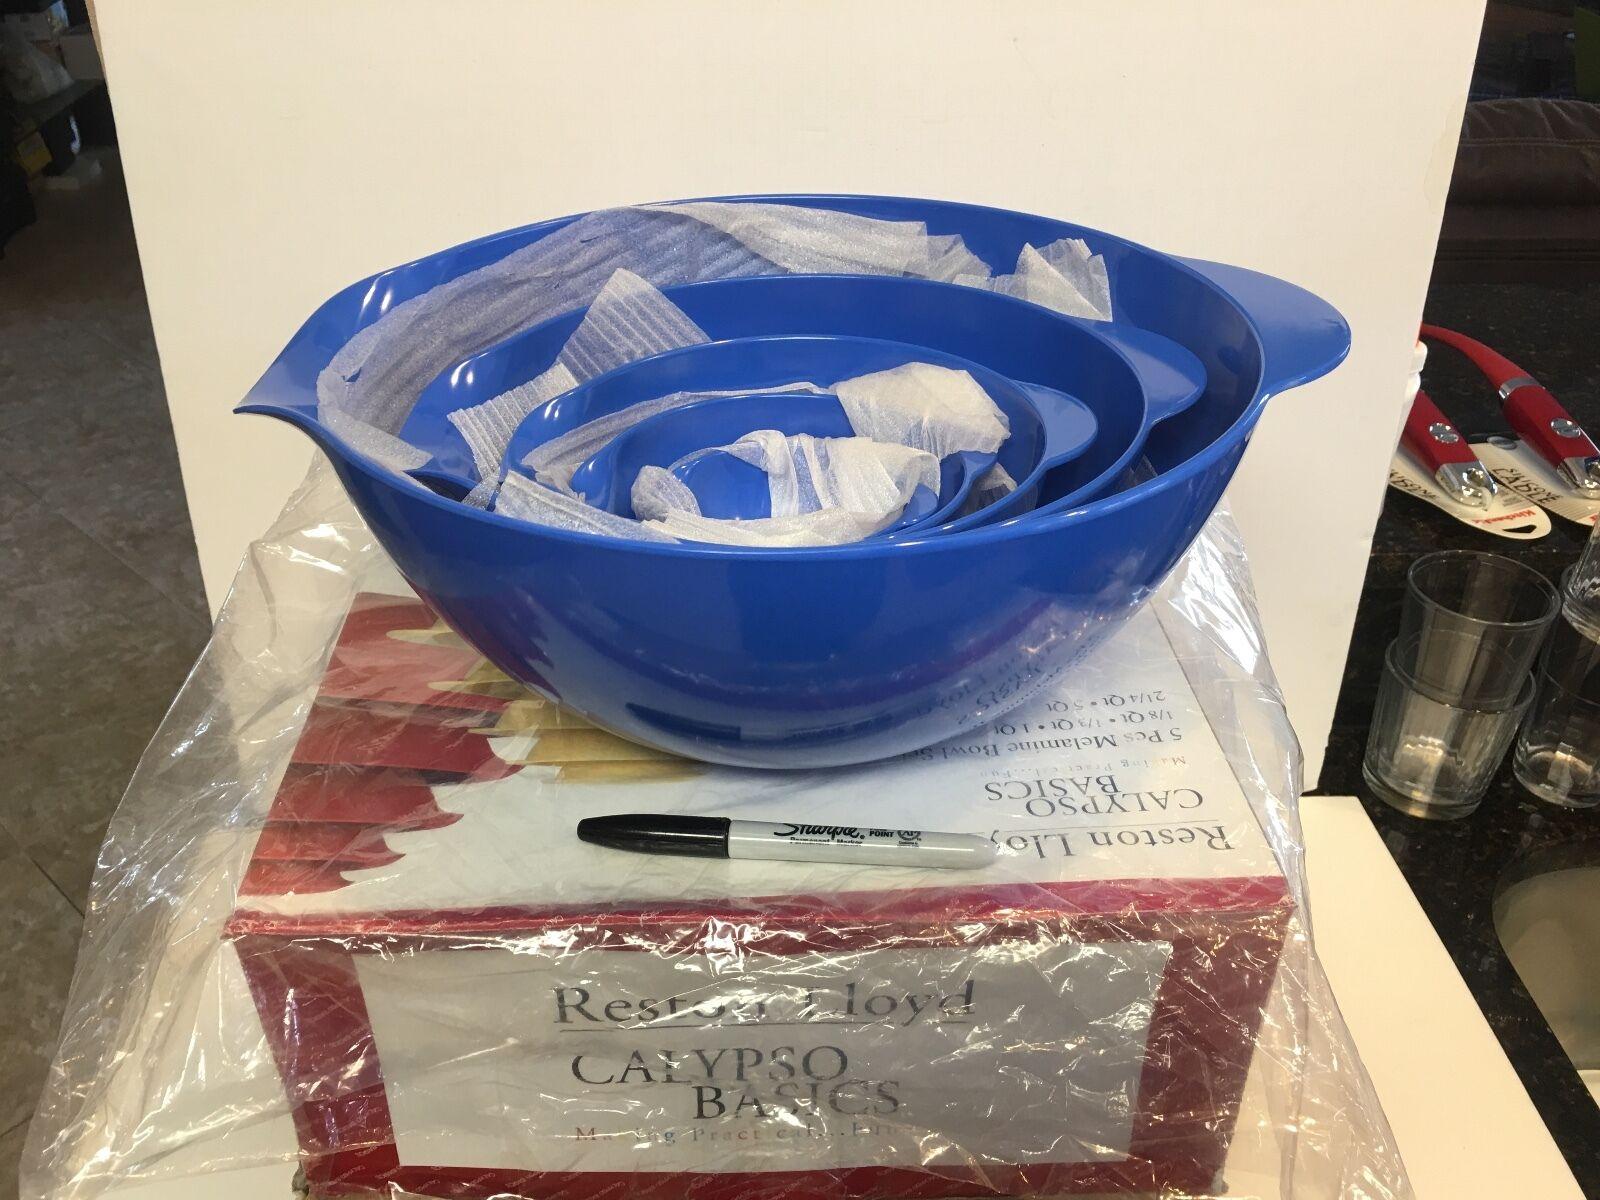 Reston Lloyd Calypso (Azur) bleu grand bol Set  LIVRAISON GRATUITE